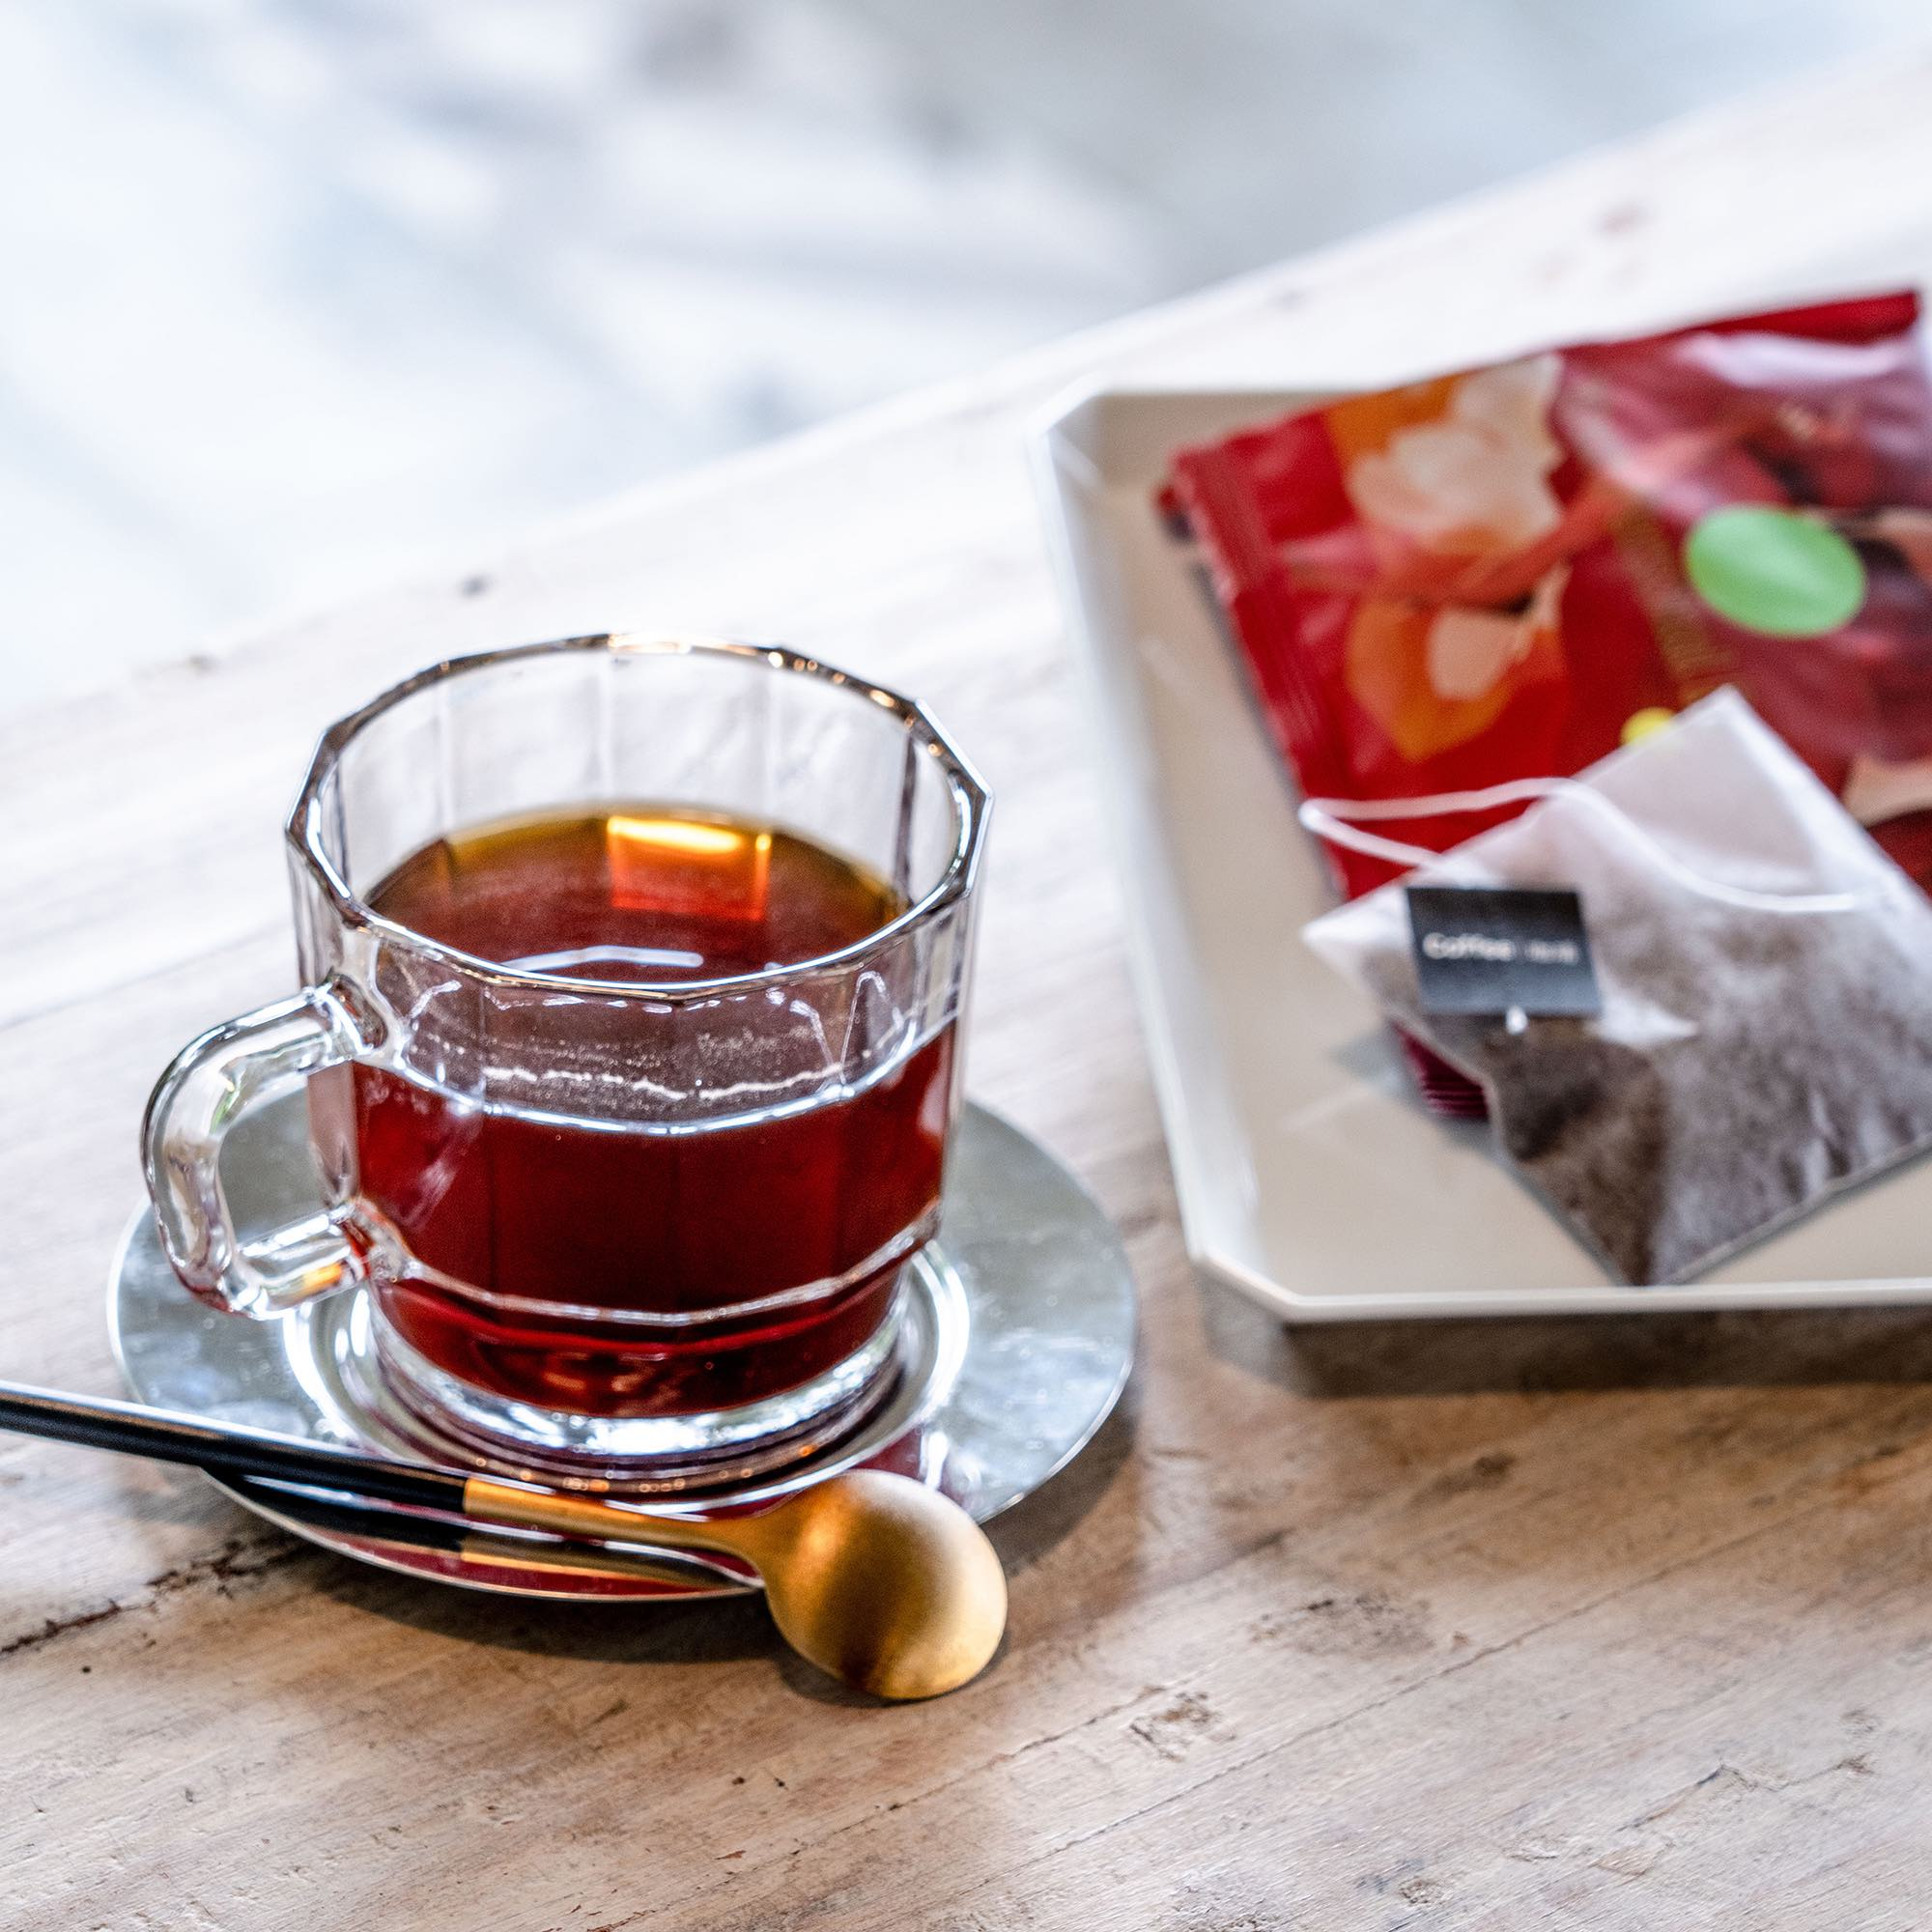 BEMO Café 浸泡系列 / 衣索比亞‧古吉‧珍珠小豆特選G1 日曬(中淺焙)